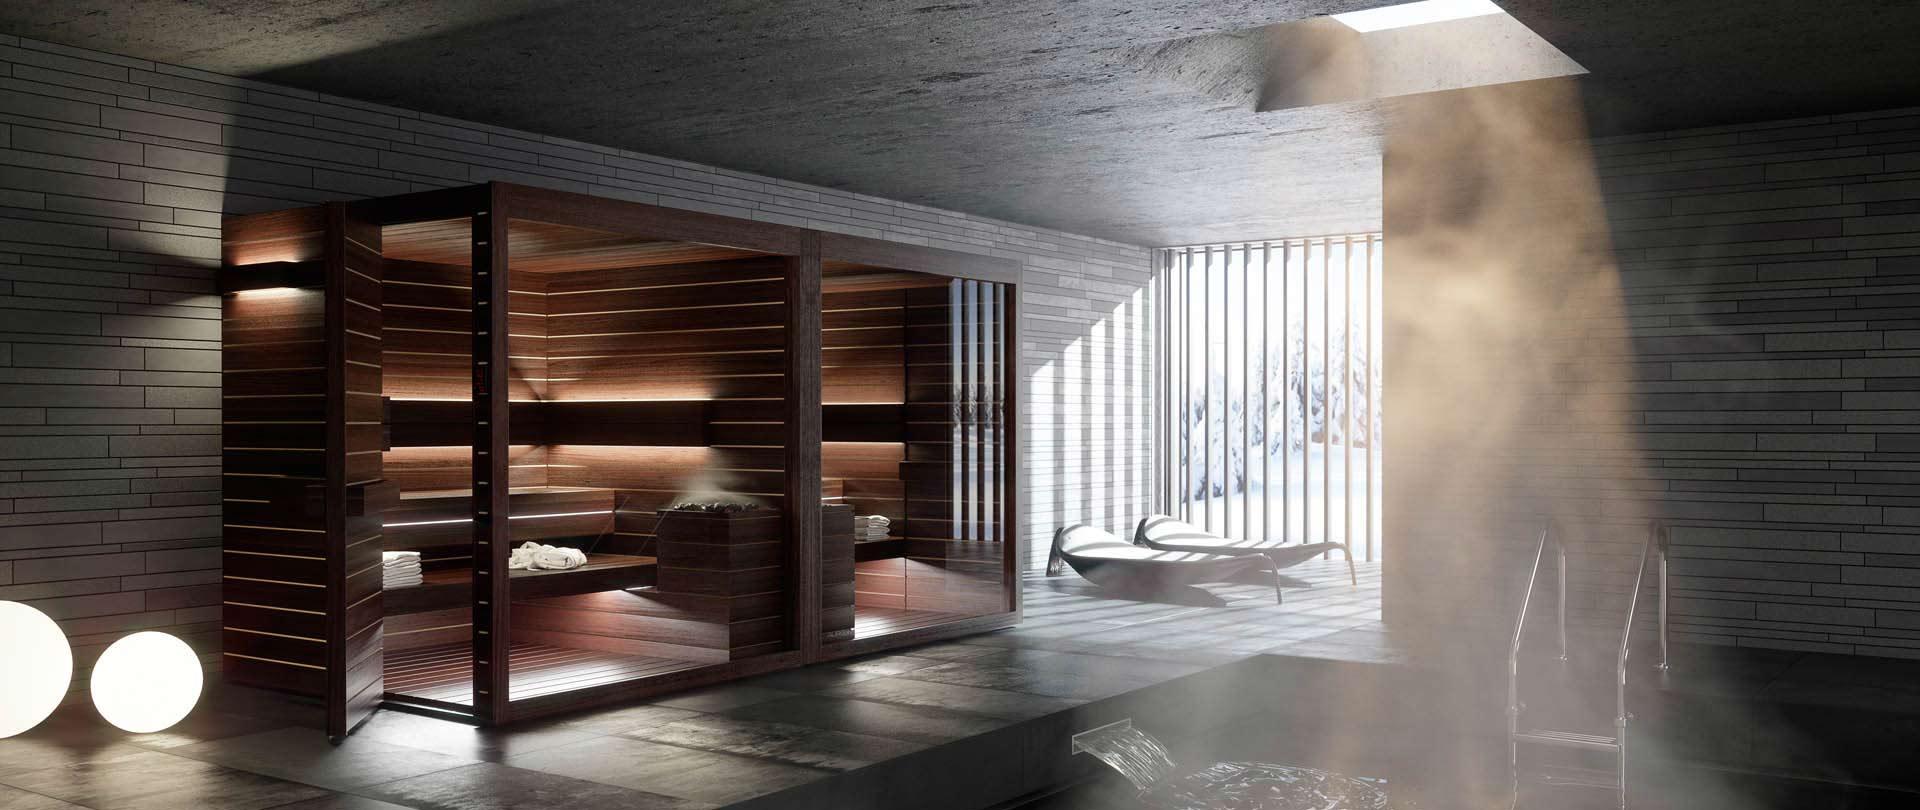 Sauna Interieur Bois Design Lumina Auroom Suisse Gex